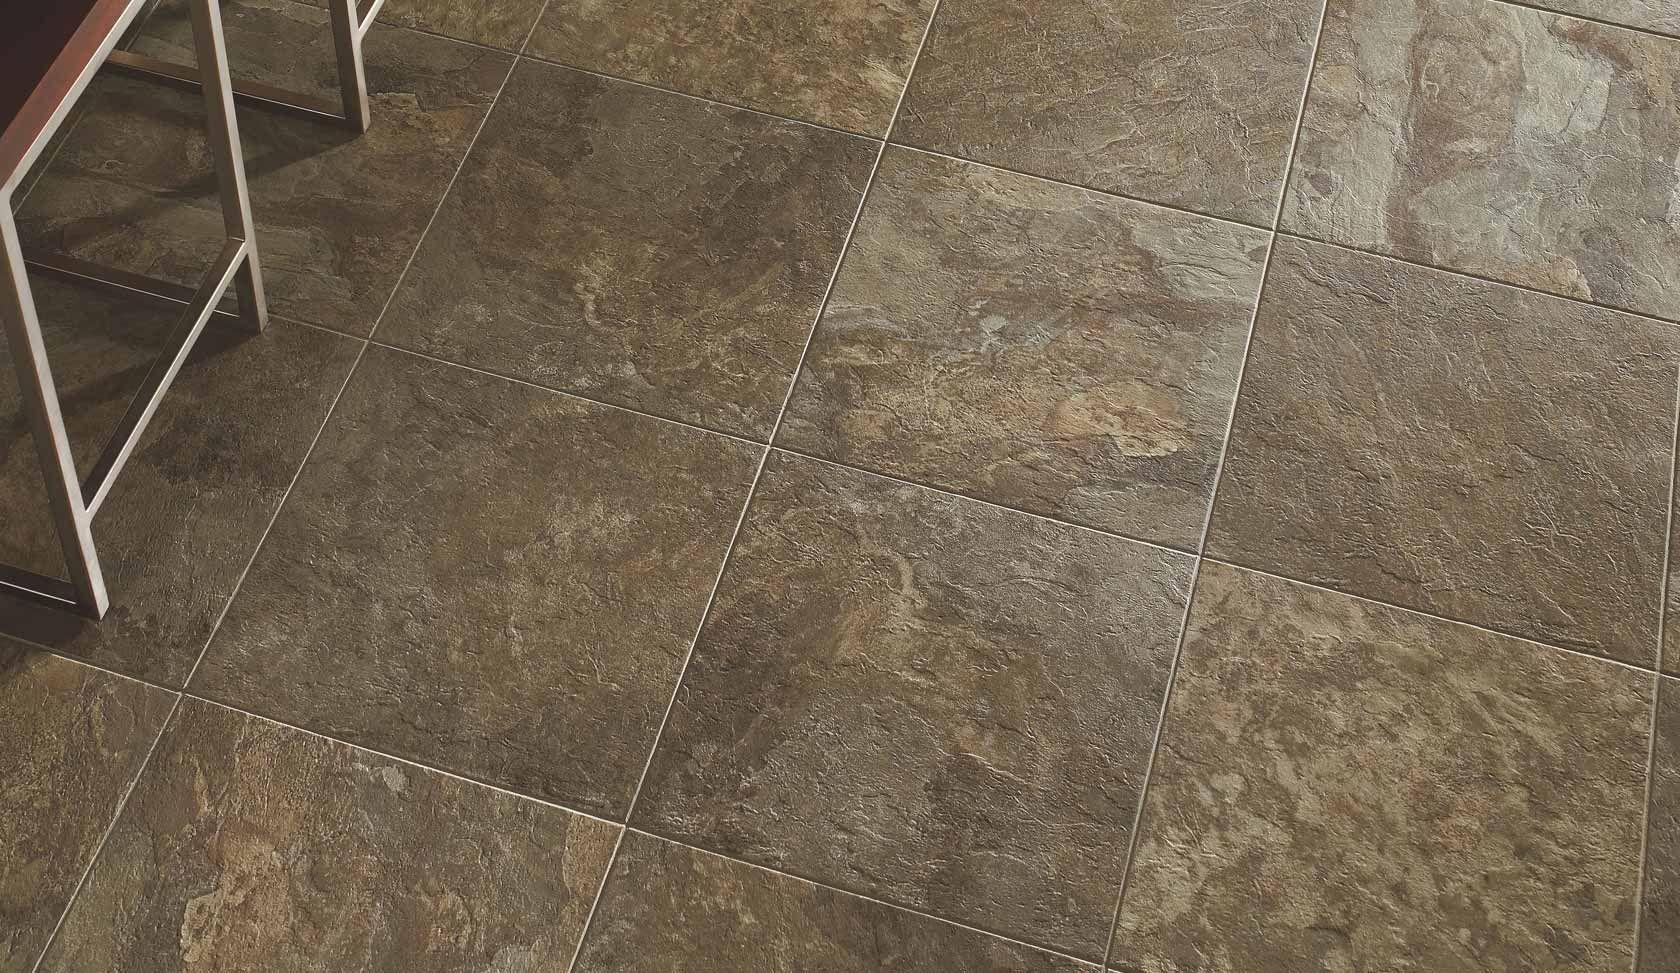 gooddesign snap tile flooring